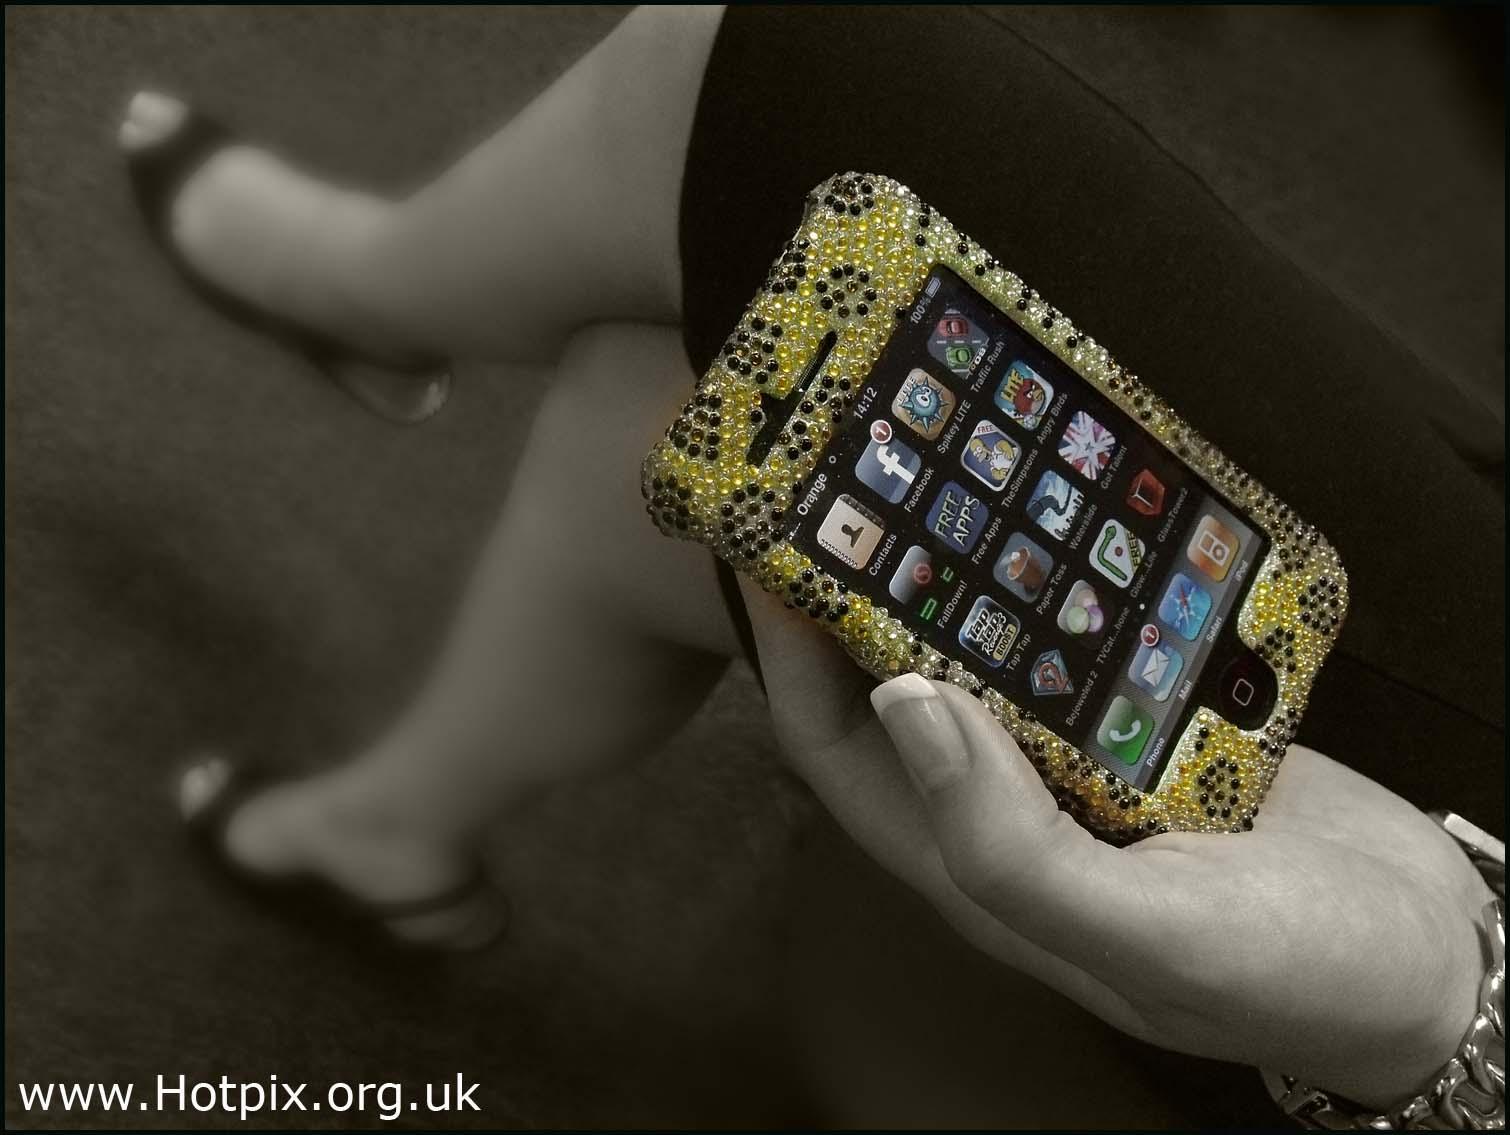 iphone,telephone,moby,mobile,apps,diamonds,gold,silver,cover,for,sex,sext,woman,womans,lady,ladies,leg,legs,stilleto,heel,heels,selective,sepia,colour,color,colores,b/w,mono,pano,hotpicks,hotpix,hotpics,hot,pix,pics,tony,smith,tonysmith,uk,mywinners,muchacha,femenina,de,la,mujer,se\u00f1ora,female,girl,\u5973\u6027\u30e1\u30b9\u306e\u5973\u6027\u306e\u5973\u306e\u5b50,\u592b\u4eba\u5973\u6027\u5987\u5973\u5973\u5b69,fille,f\u00e9minine,femme,dame